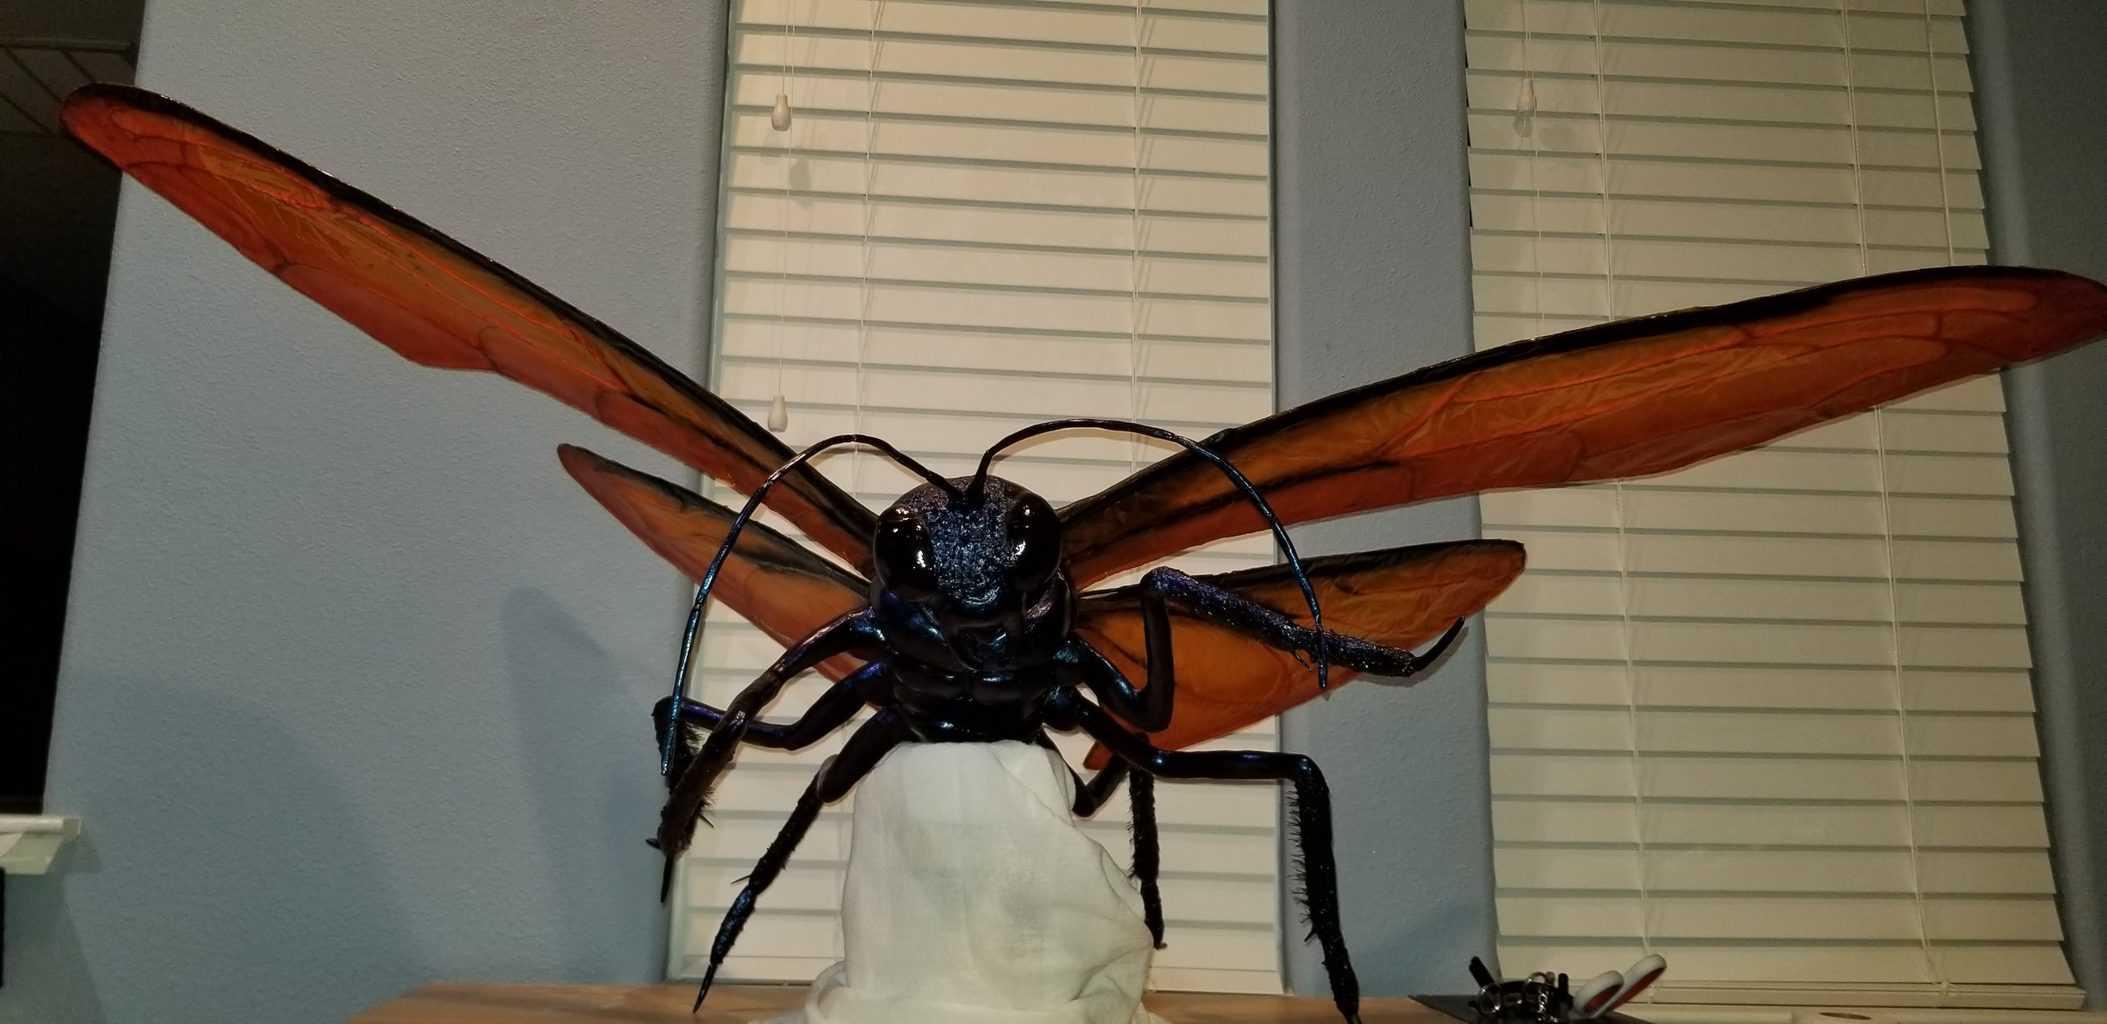 Tarantula hawk made with paper mache clay